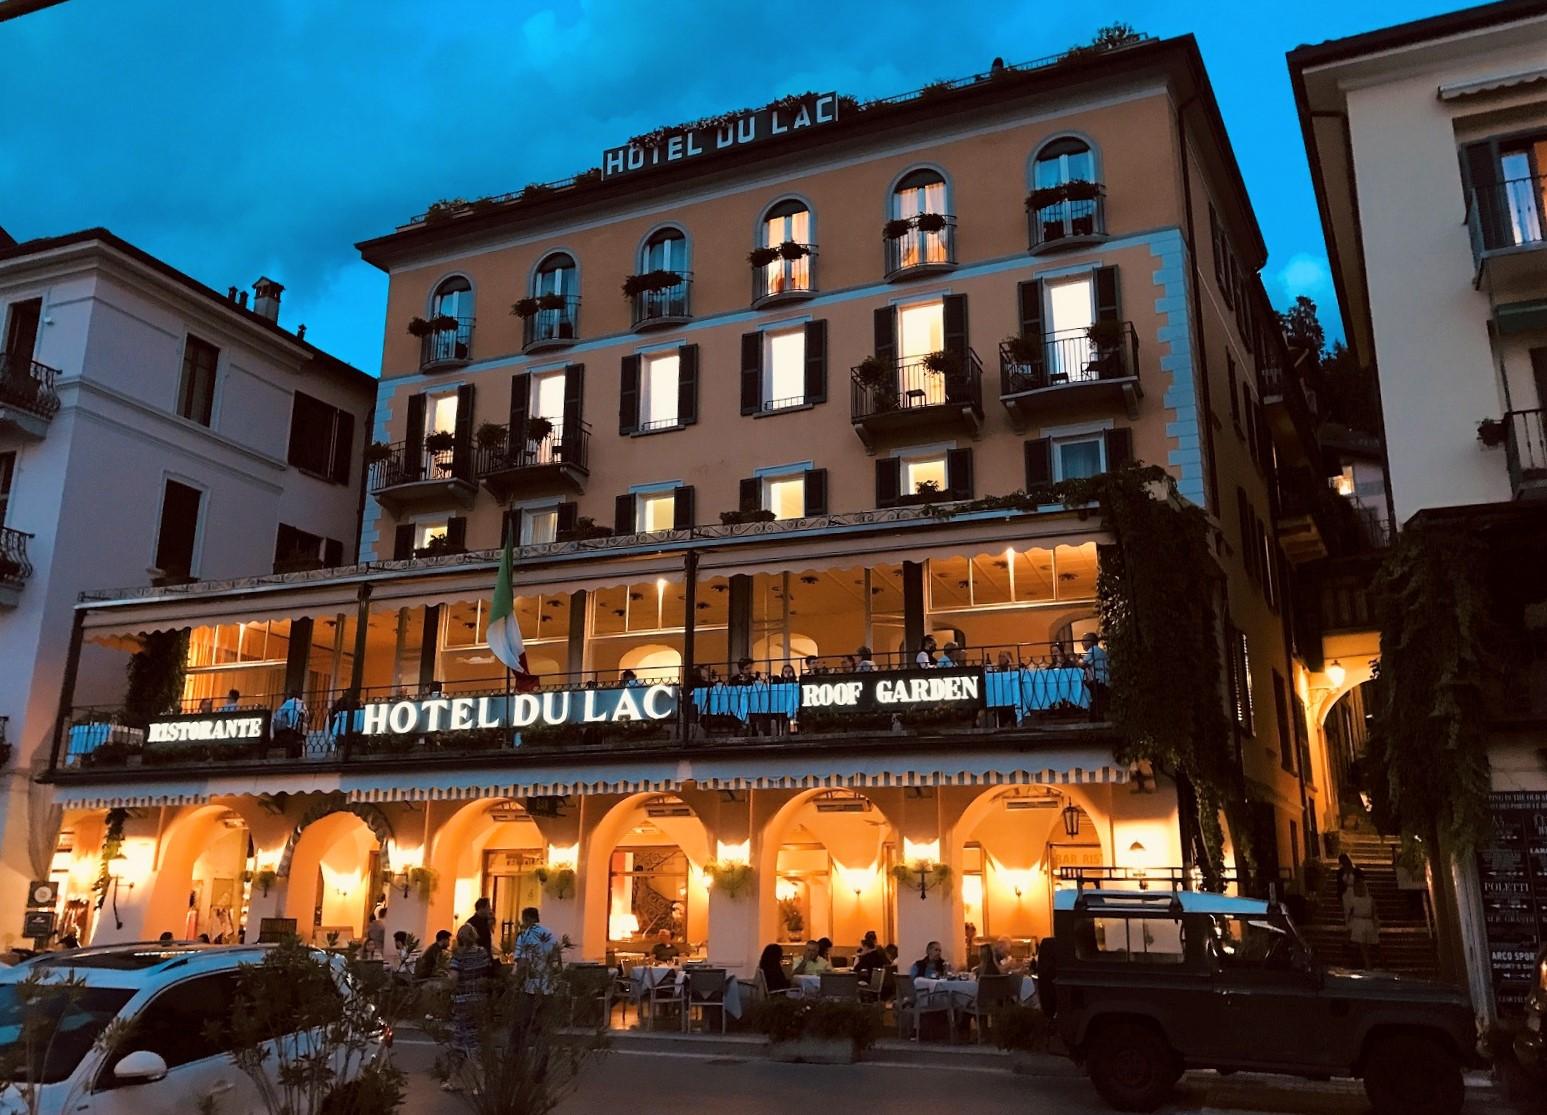 Hotel De Luc in Bellagio at night